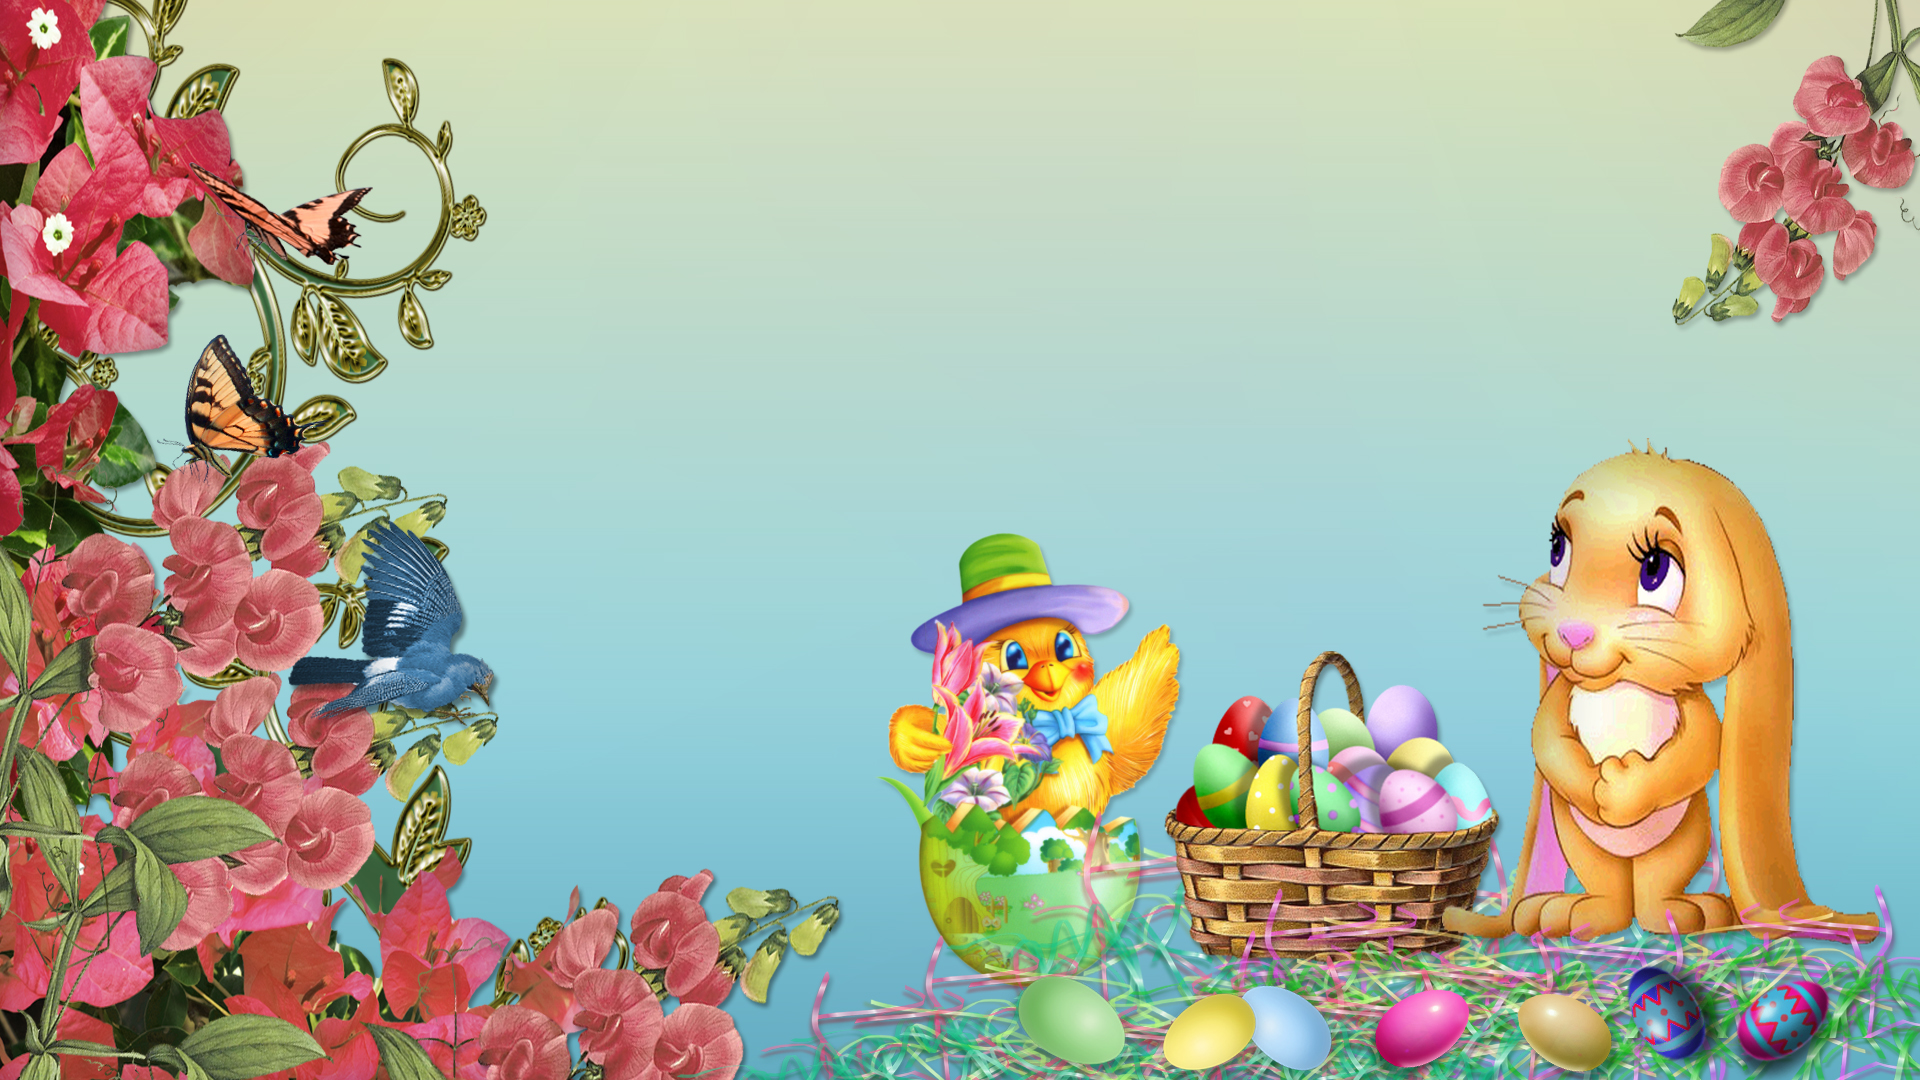 47] Easter Wallpaper for Facebook on WallpaperSafari 1920x1080